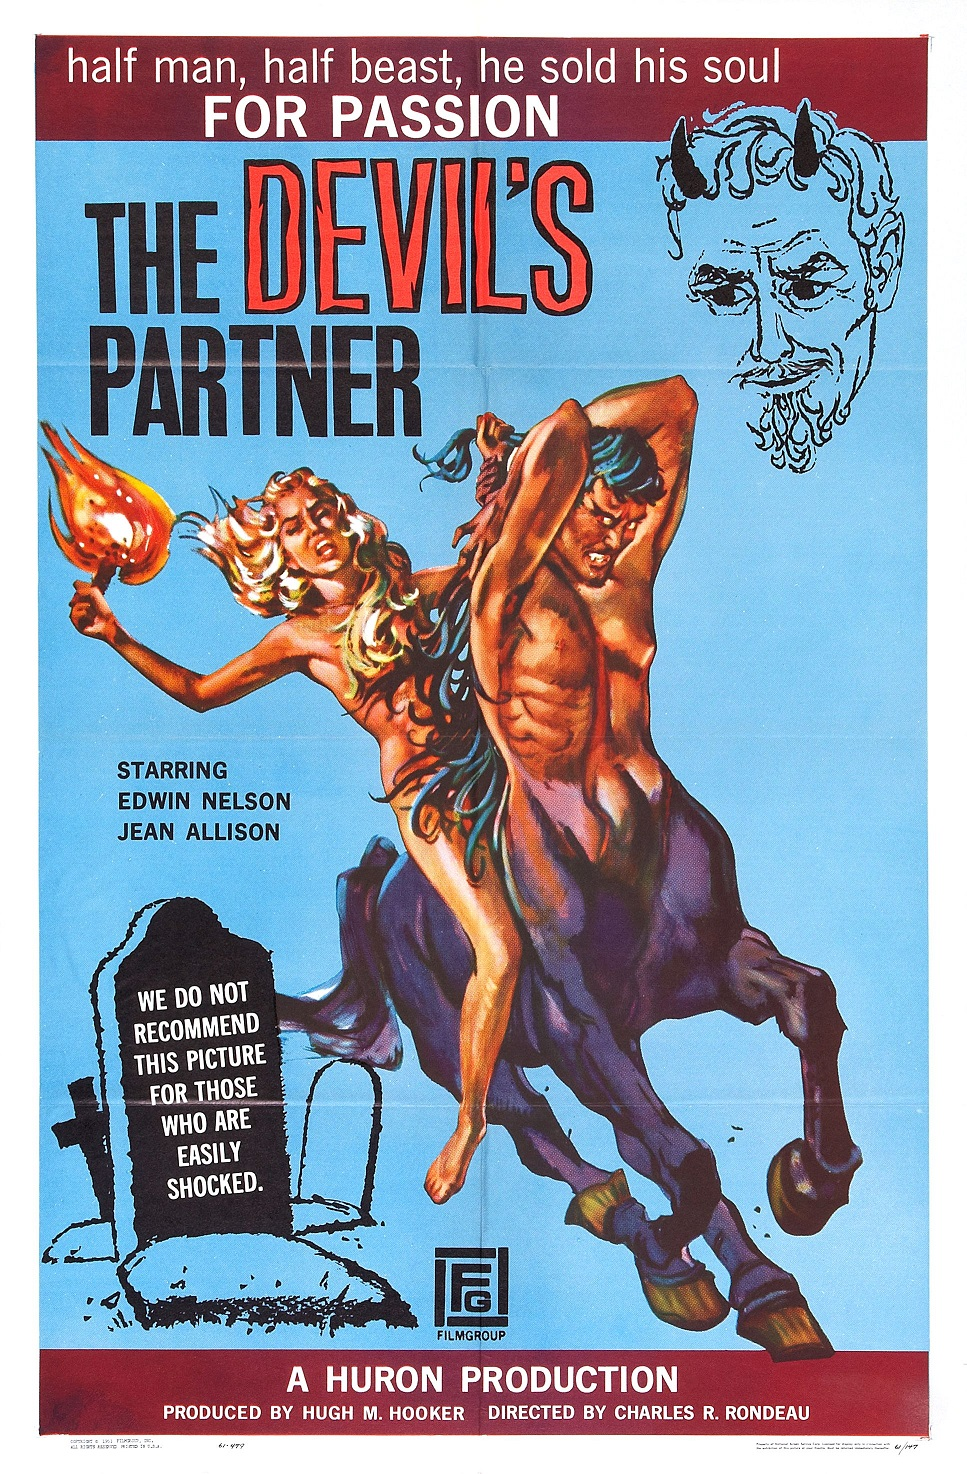 devils-partner-1kite44devils-partner-1devils-partner-14devils-partner-13devils-partner-11